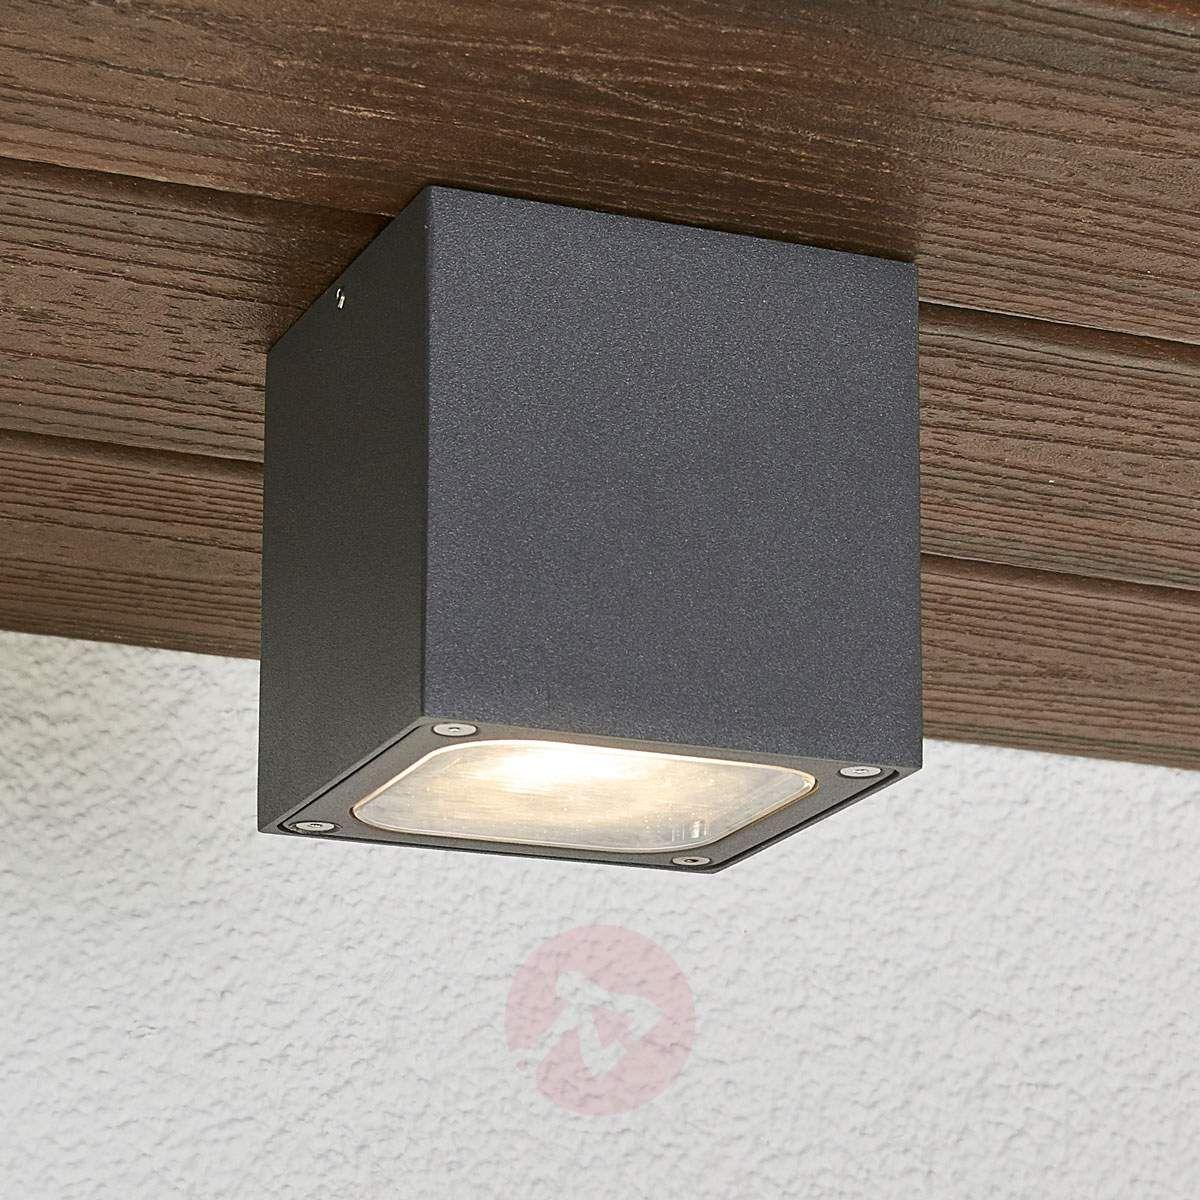 Lampa Sufitowa Zewnętrzna Led Tanea Ip54 Lampy Sufitowe